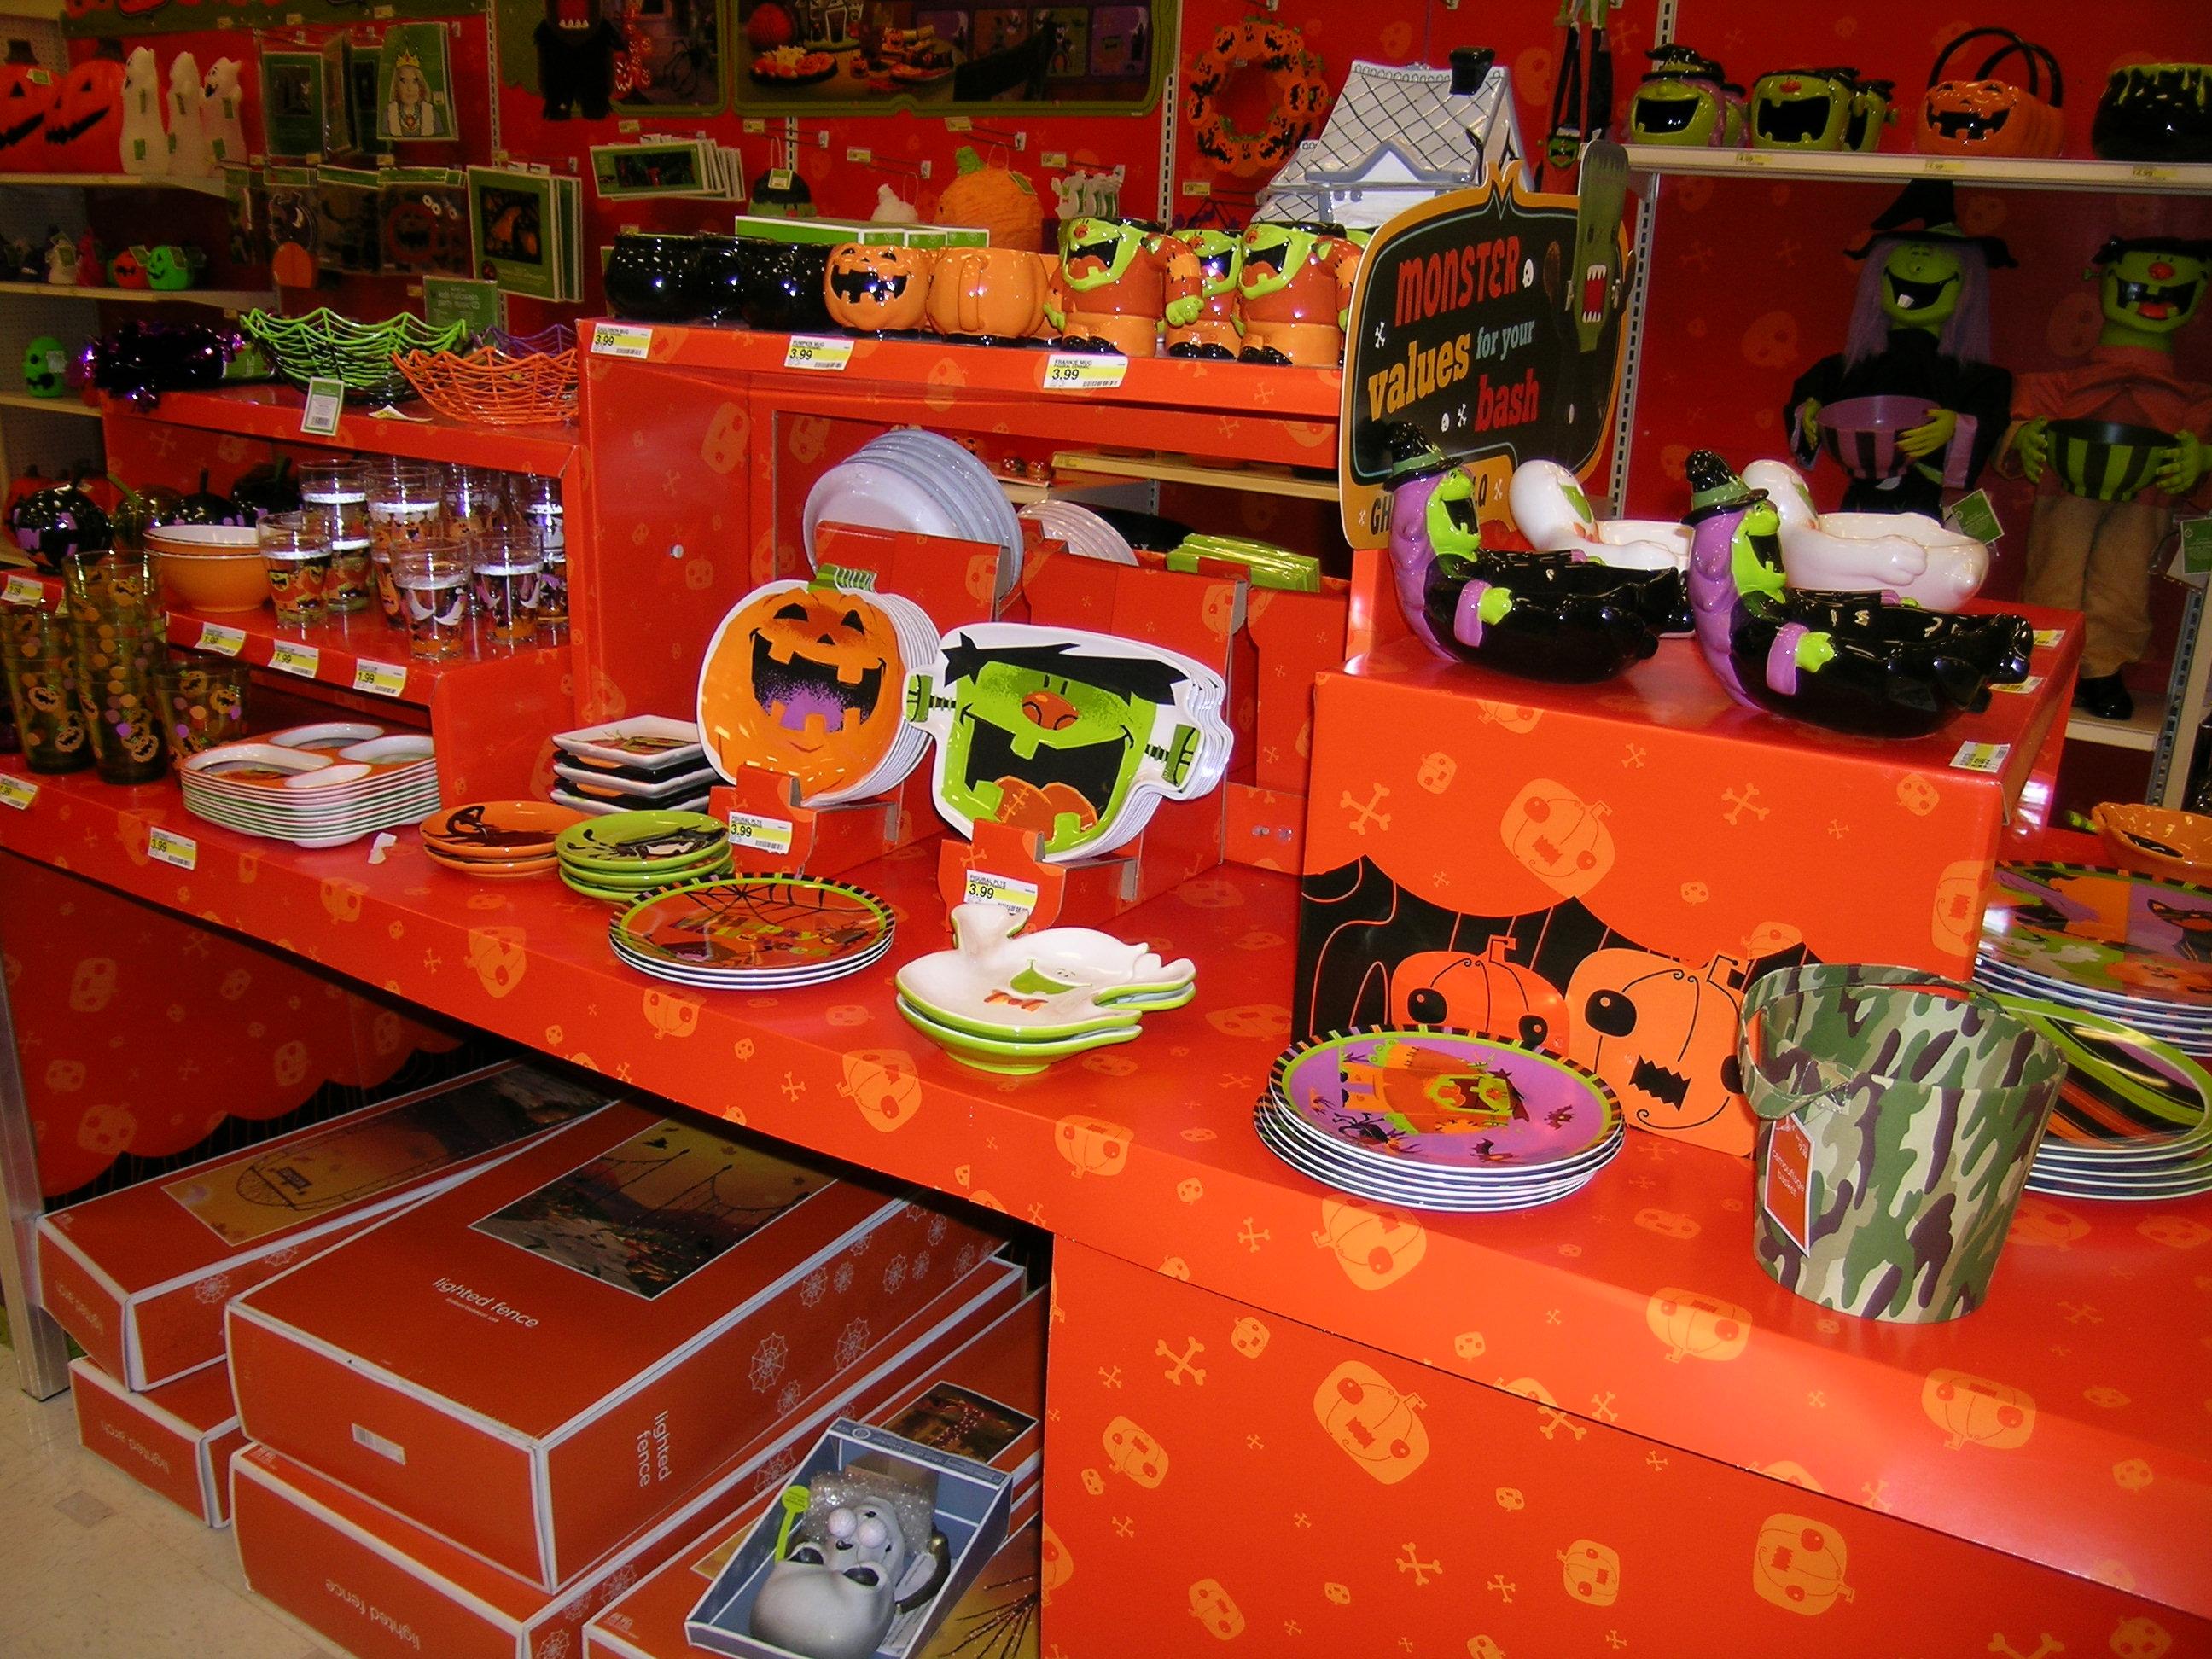 Target Halloween Decor 2008 Explore Smurfwreck77 39 S Photos Flickr Photo Sharing